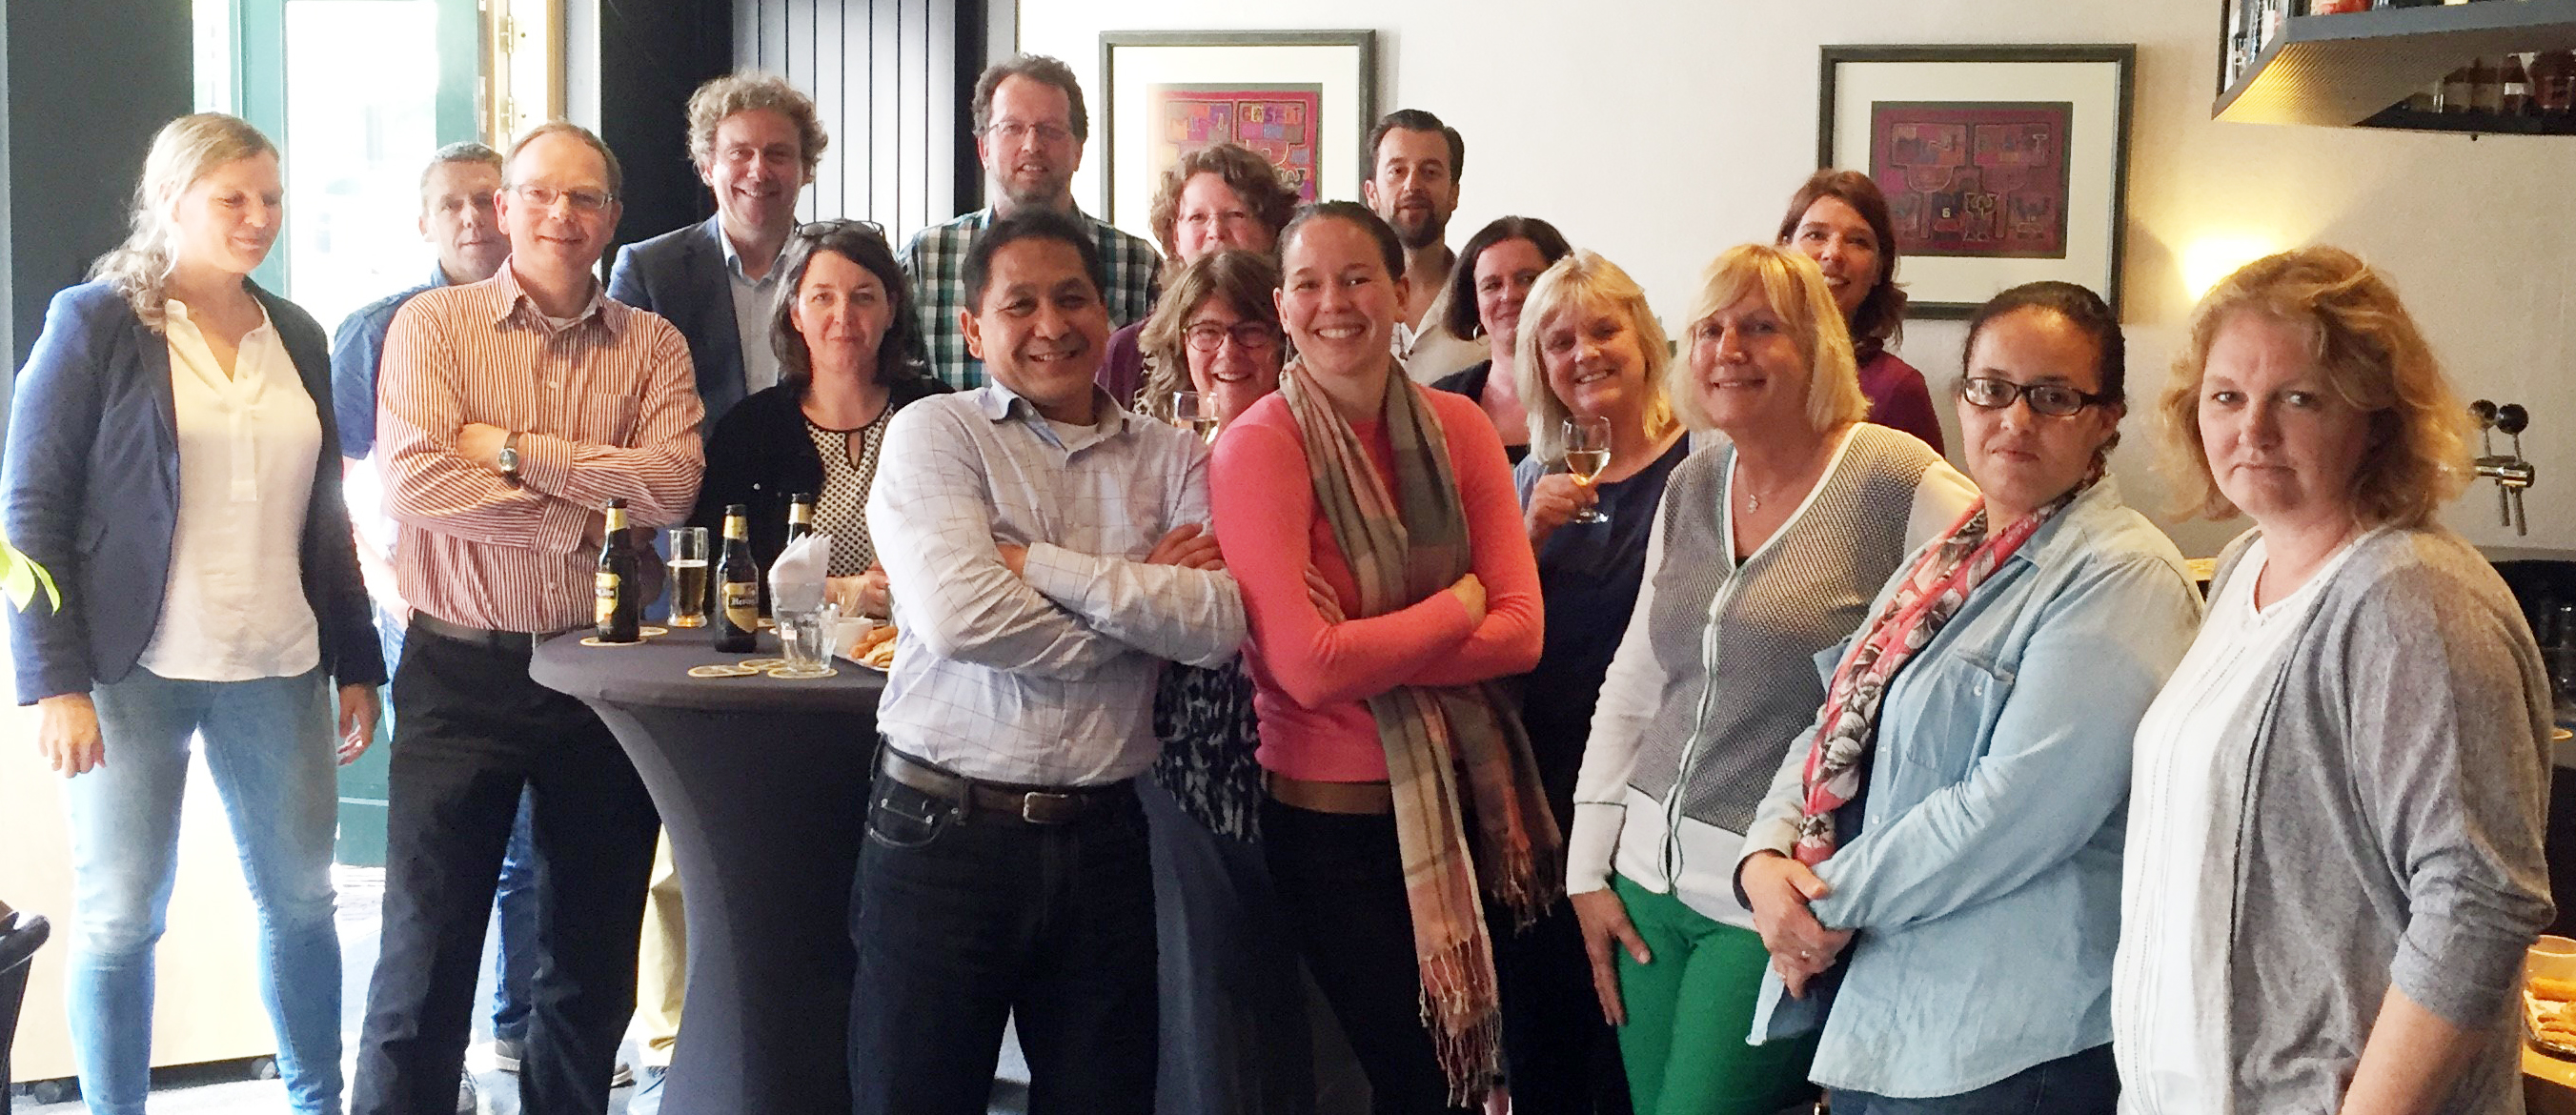 Seminar Ontketen Teamkracht 3 juni 2016